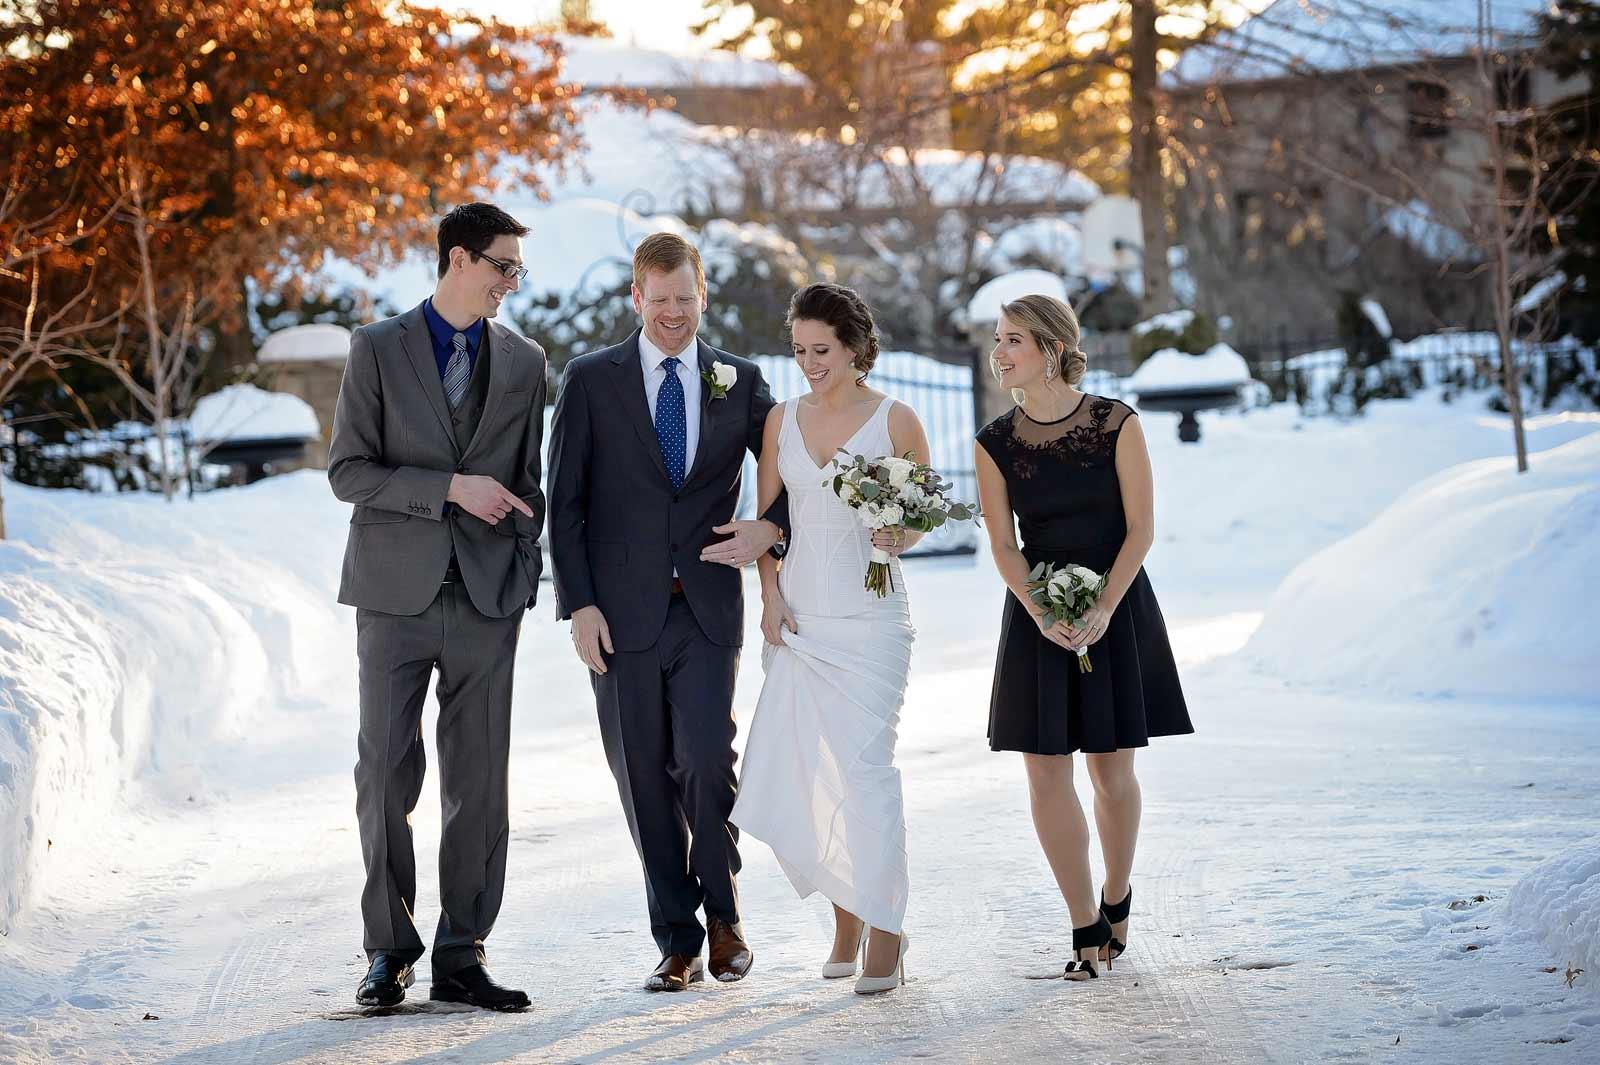 ValerieBrian-Wedding-sneakpeek-06